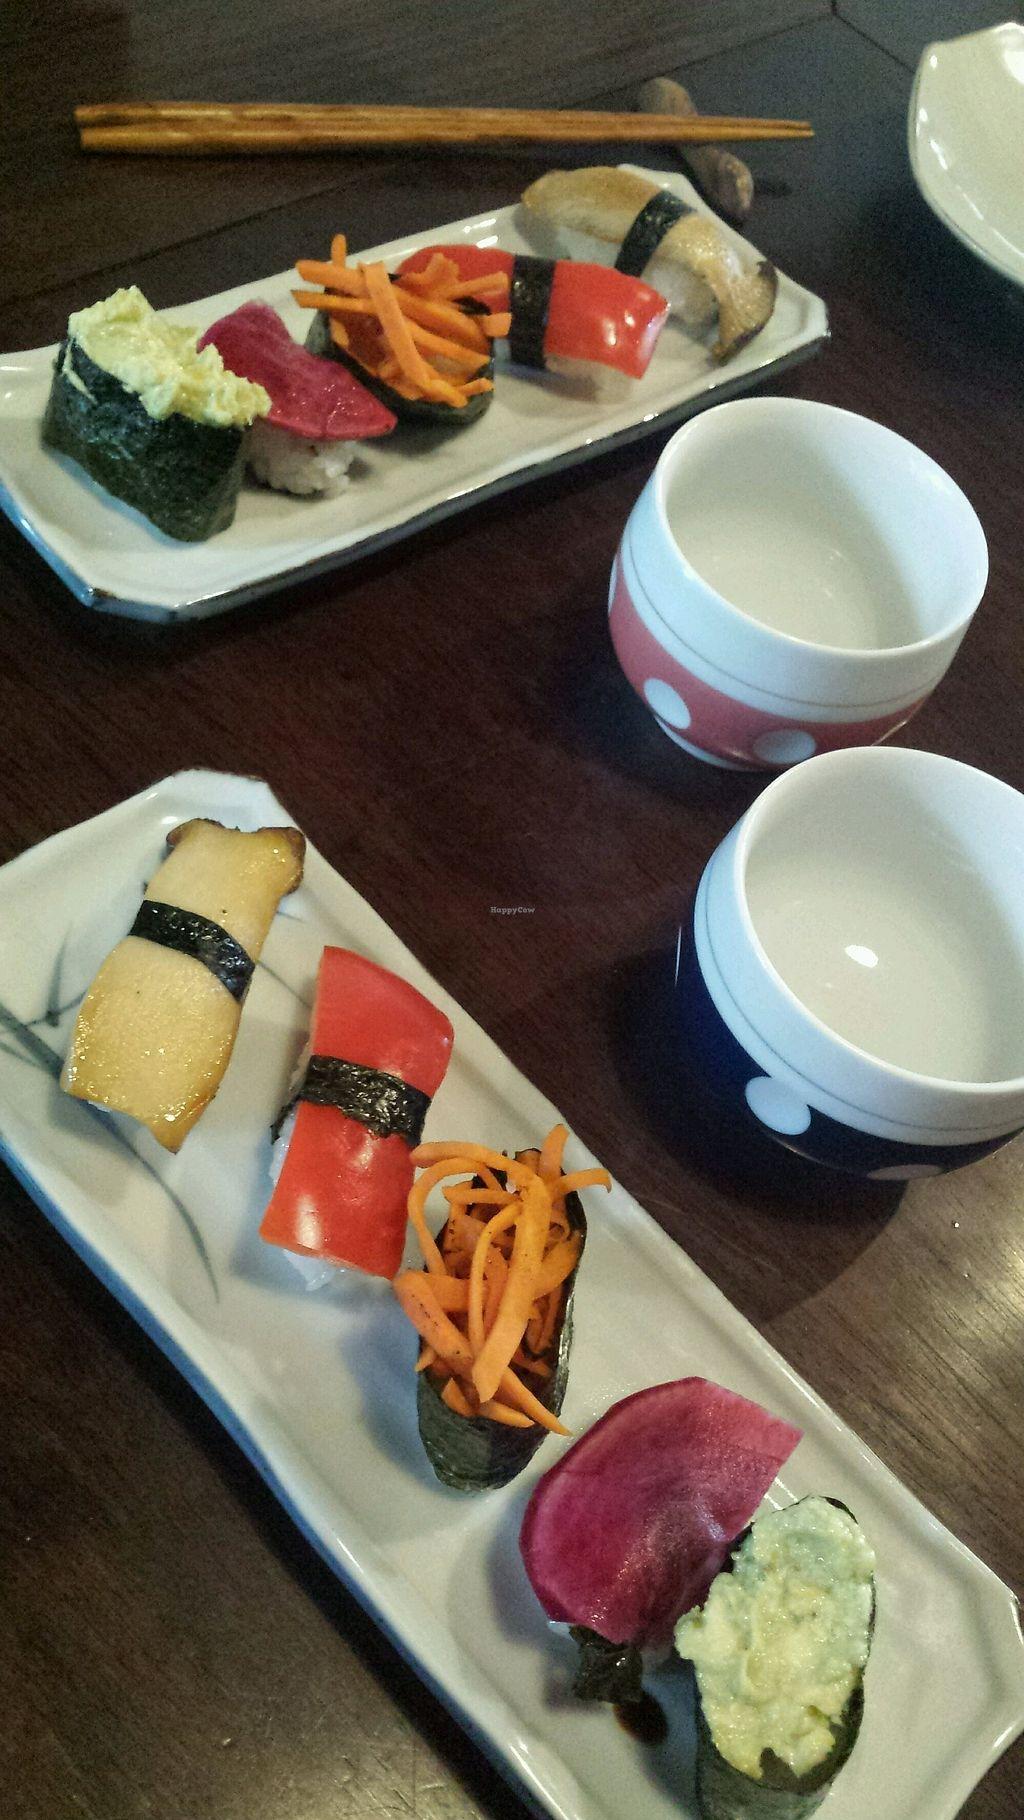 "Photo of Itadakizen Kyoto  by <a href=""/members/profile/FabianBr%C3%A4u"">FabianBräu</a> <br/>vegan sushi <br/> February 25, 2018  - <a href='/contact/abuse/image/110323/363471'>Report</a>"